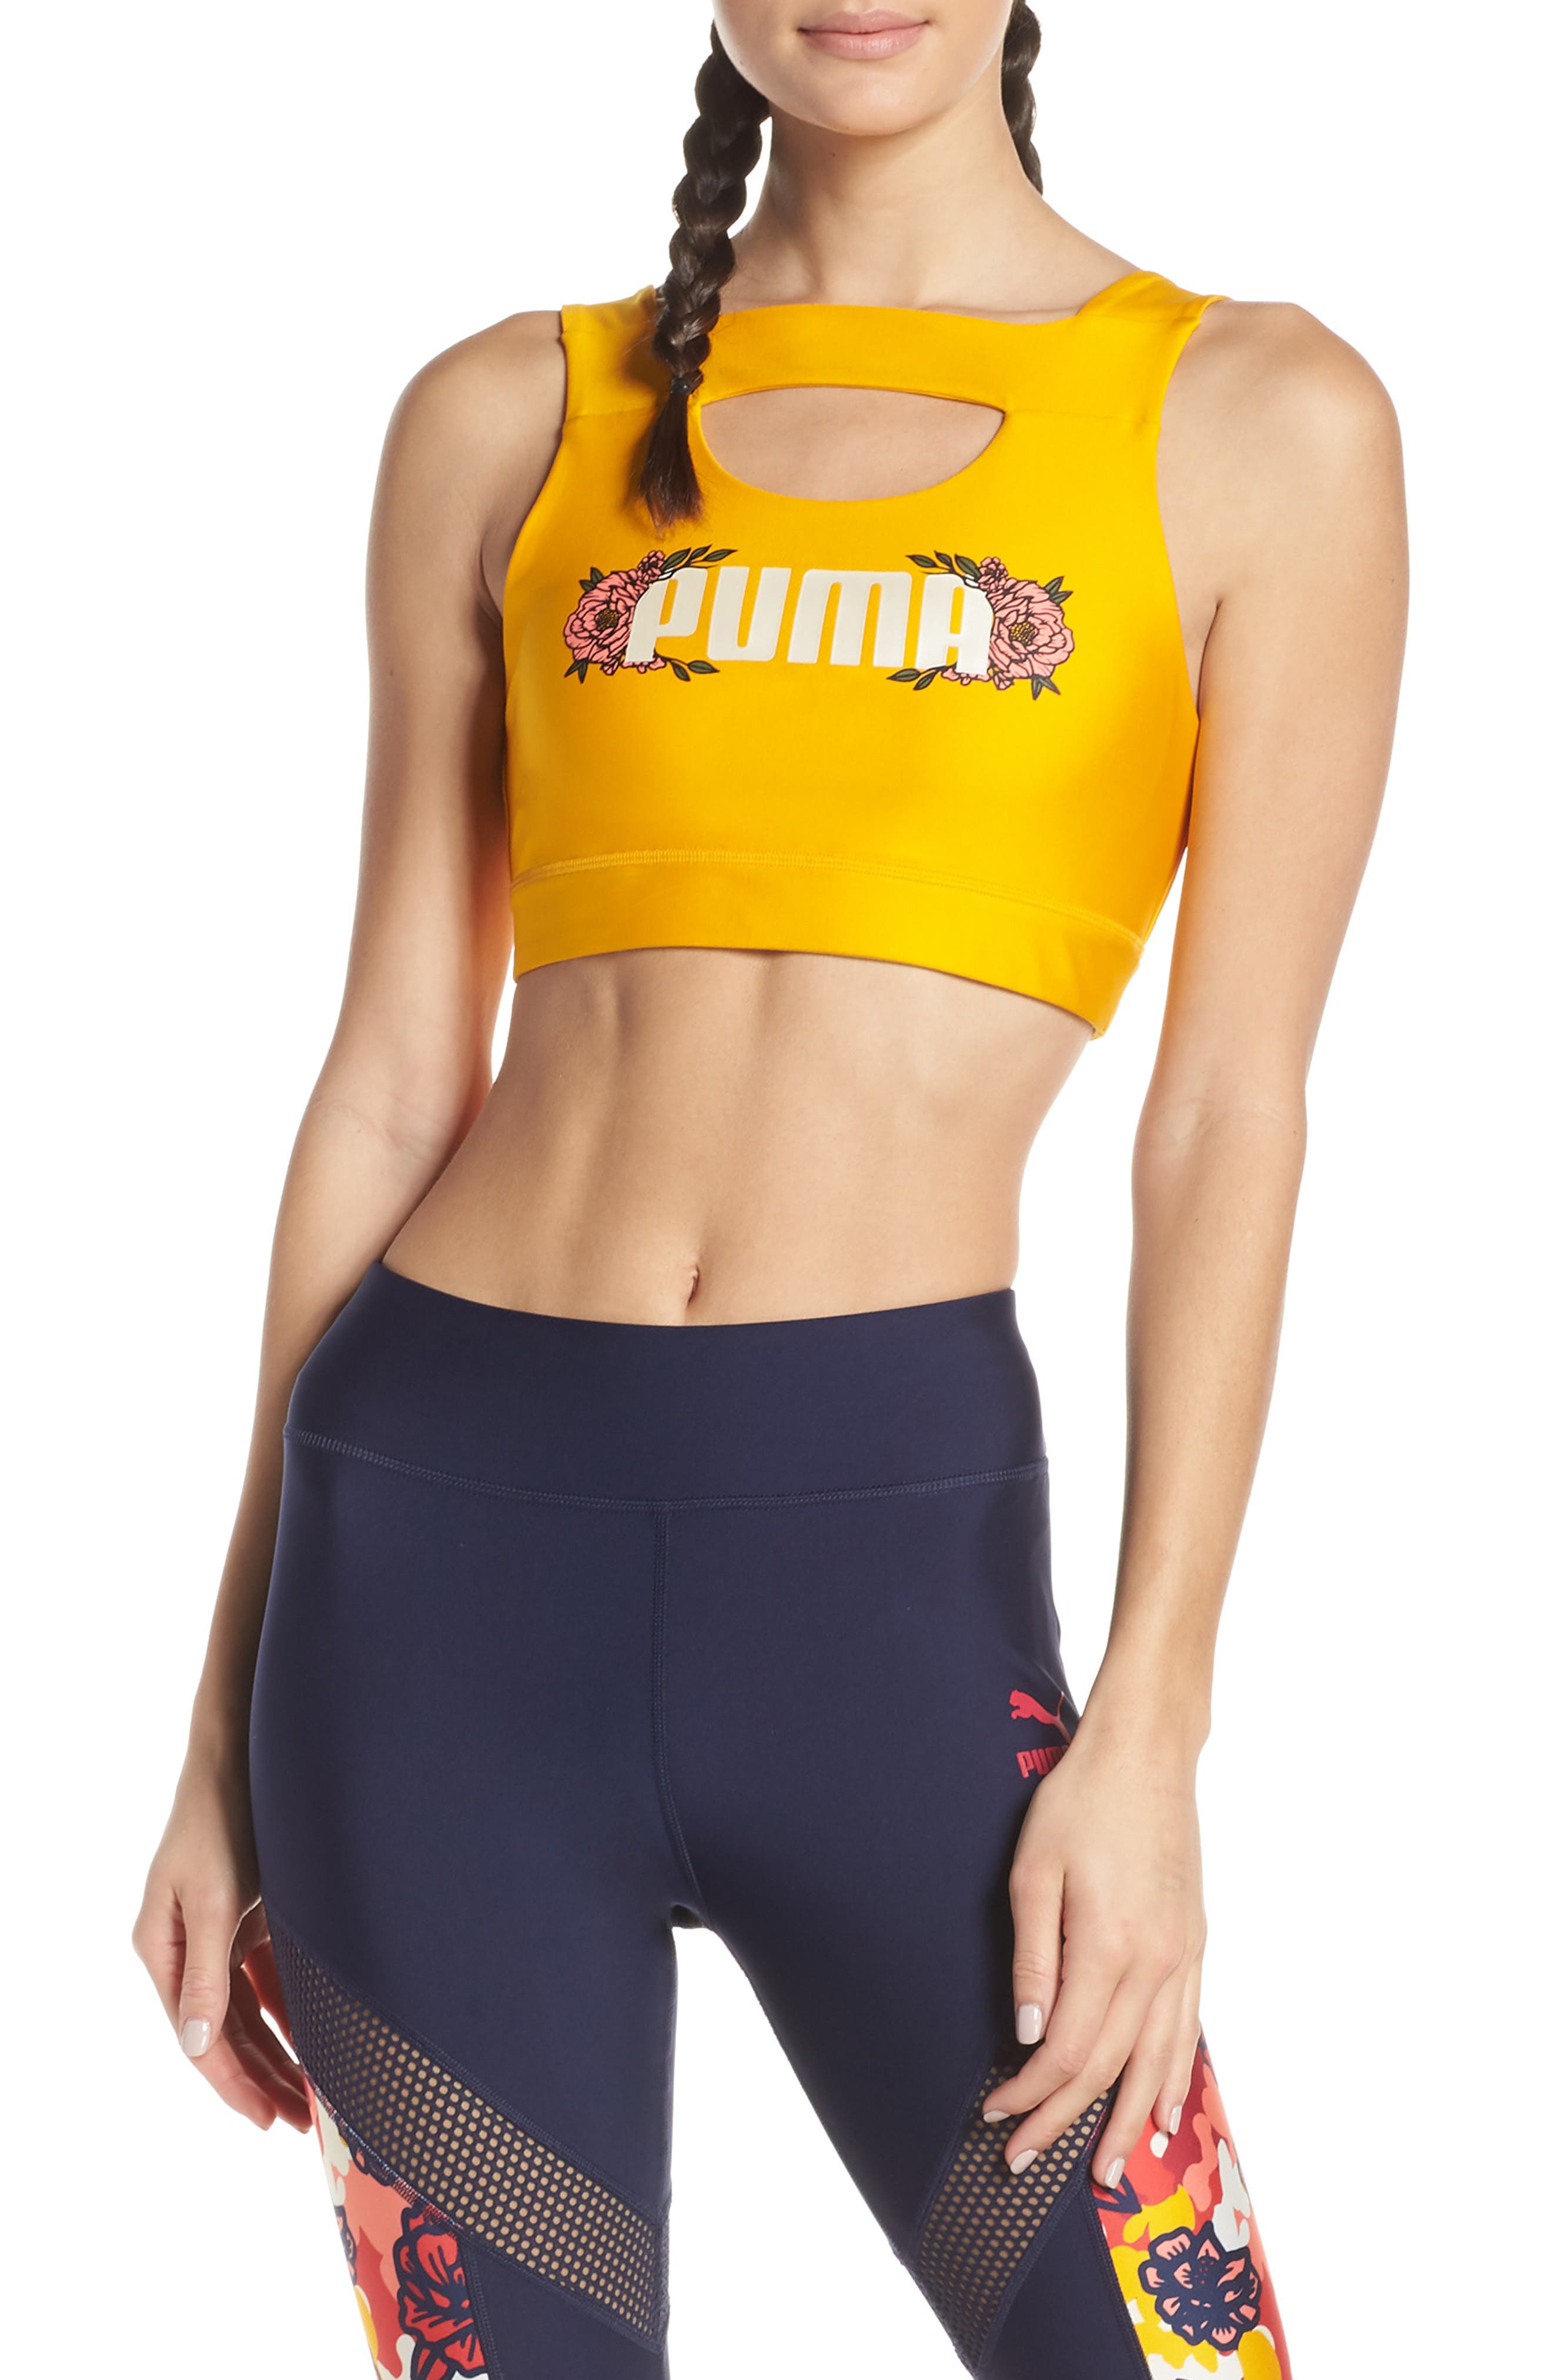 Puma Flourish Crop Top, Yellow